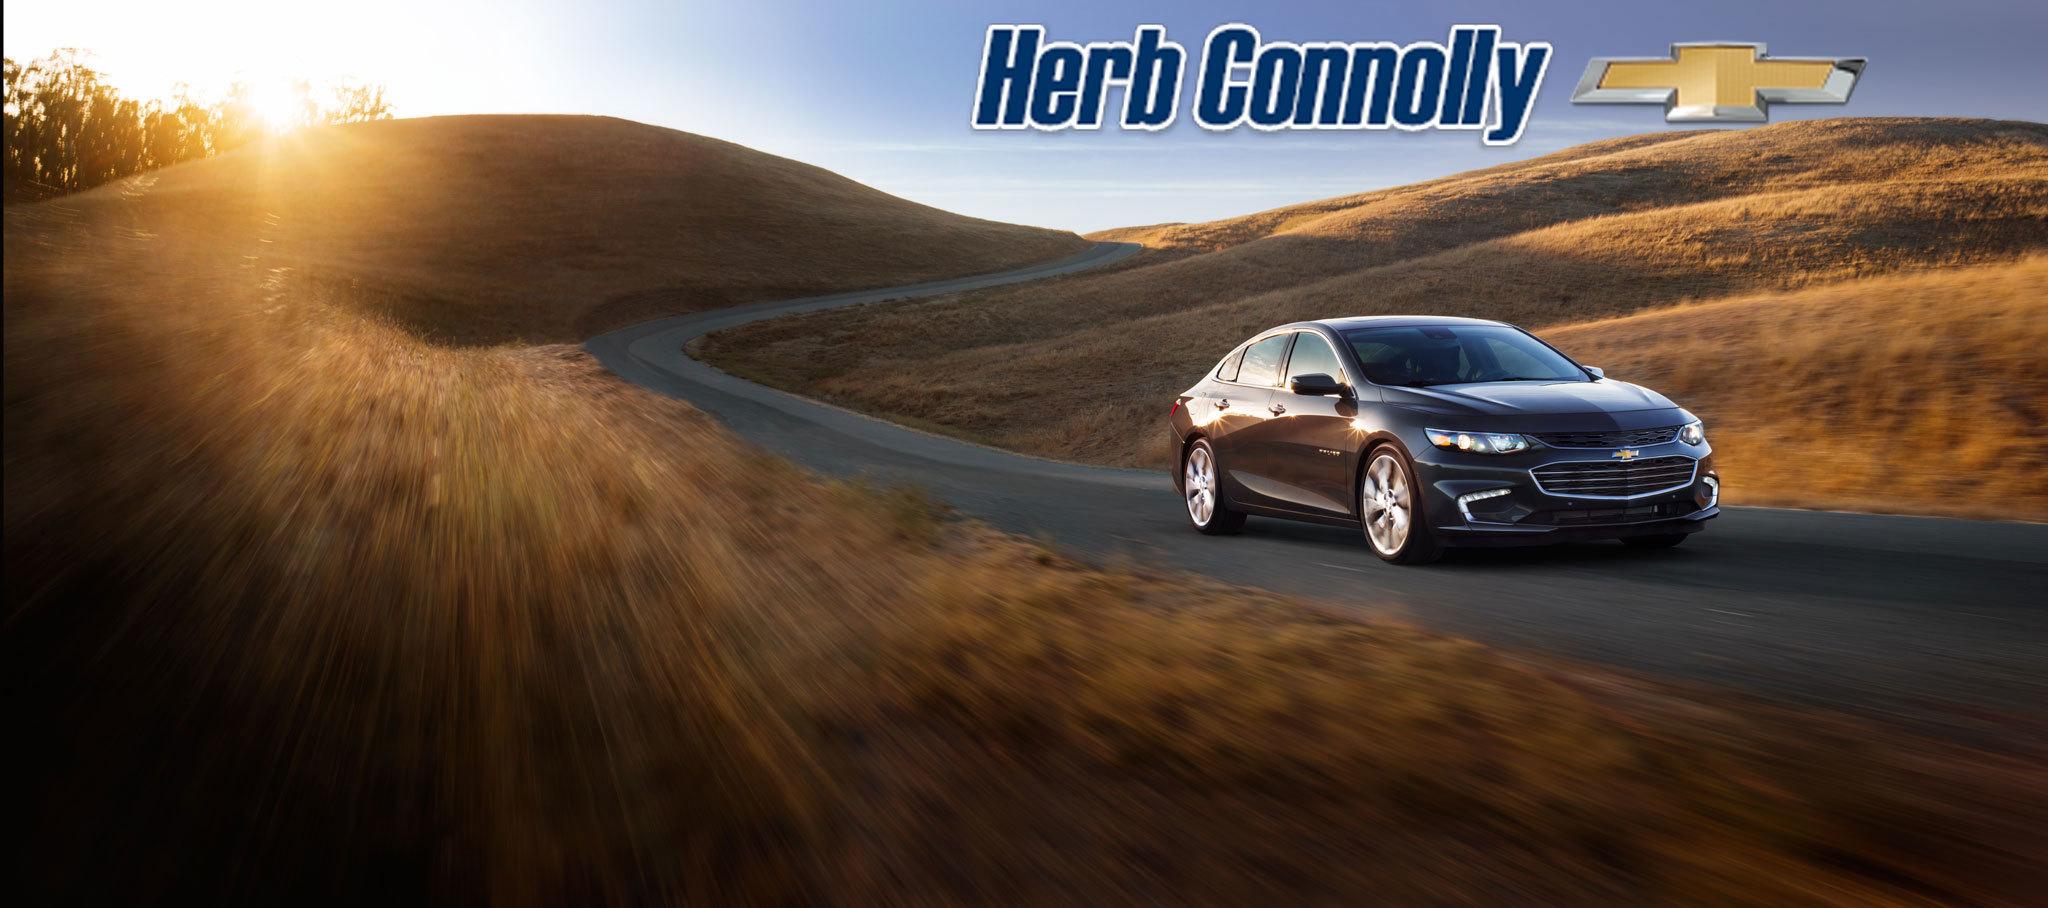 Chevymalibuma Herb Connolly Chevrolet Framingham Ma